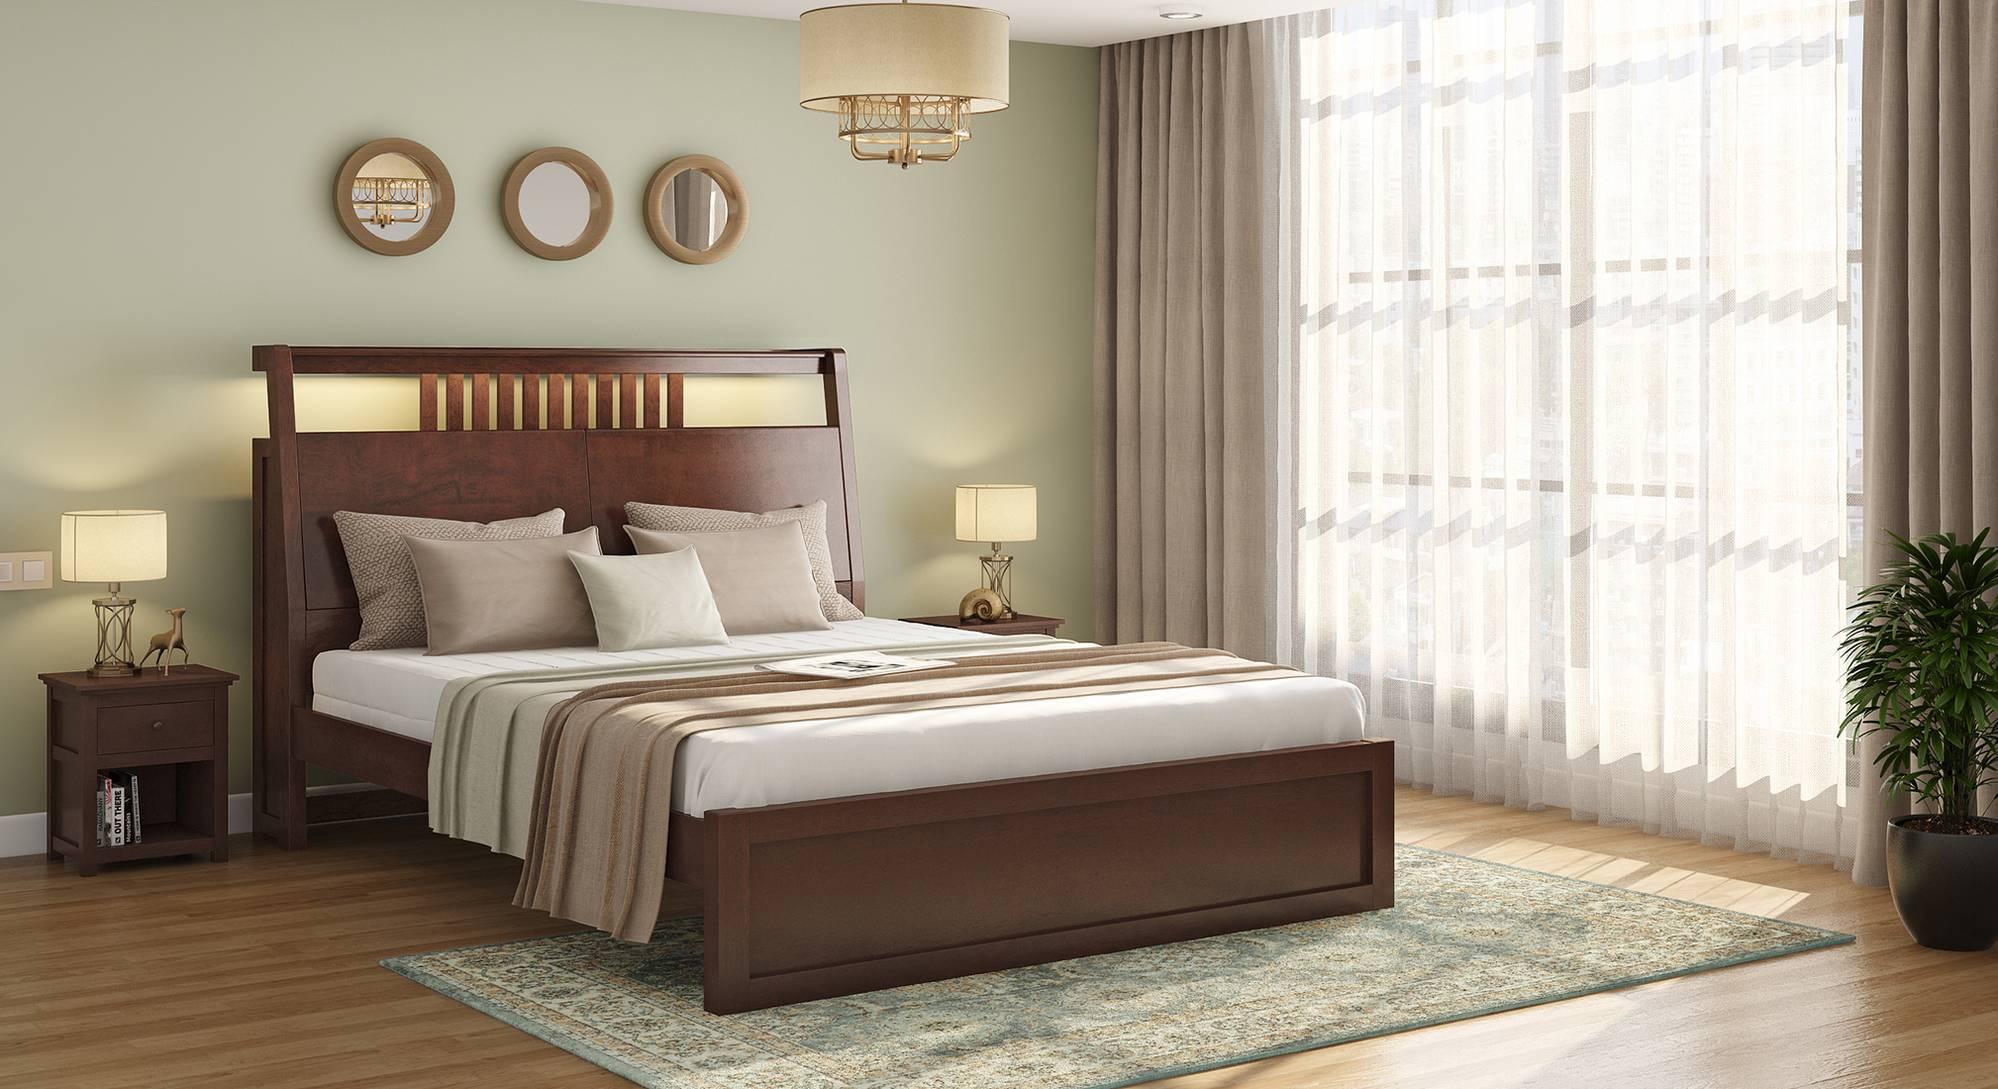 Amelia Smart Bed With Headboard Storage Solid Wood Urban Ladder